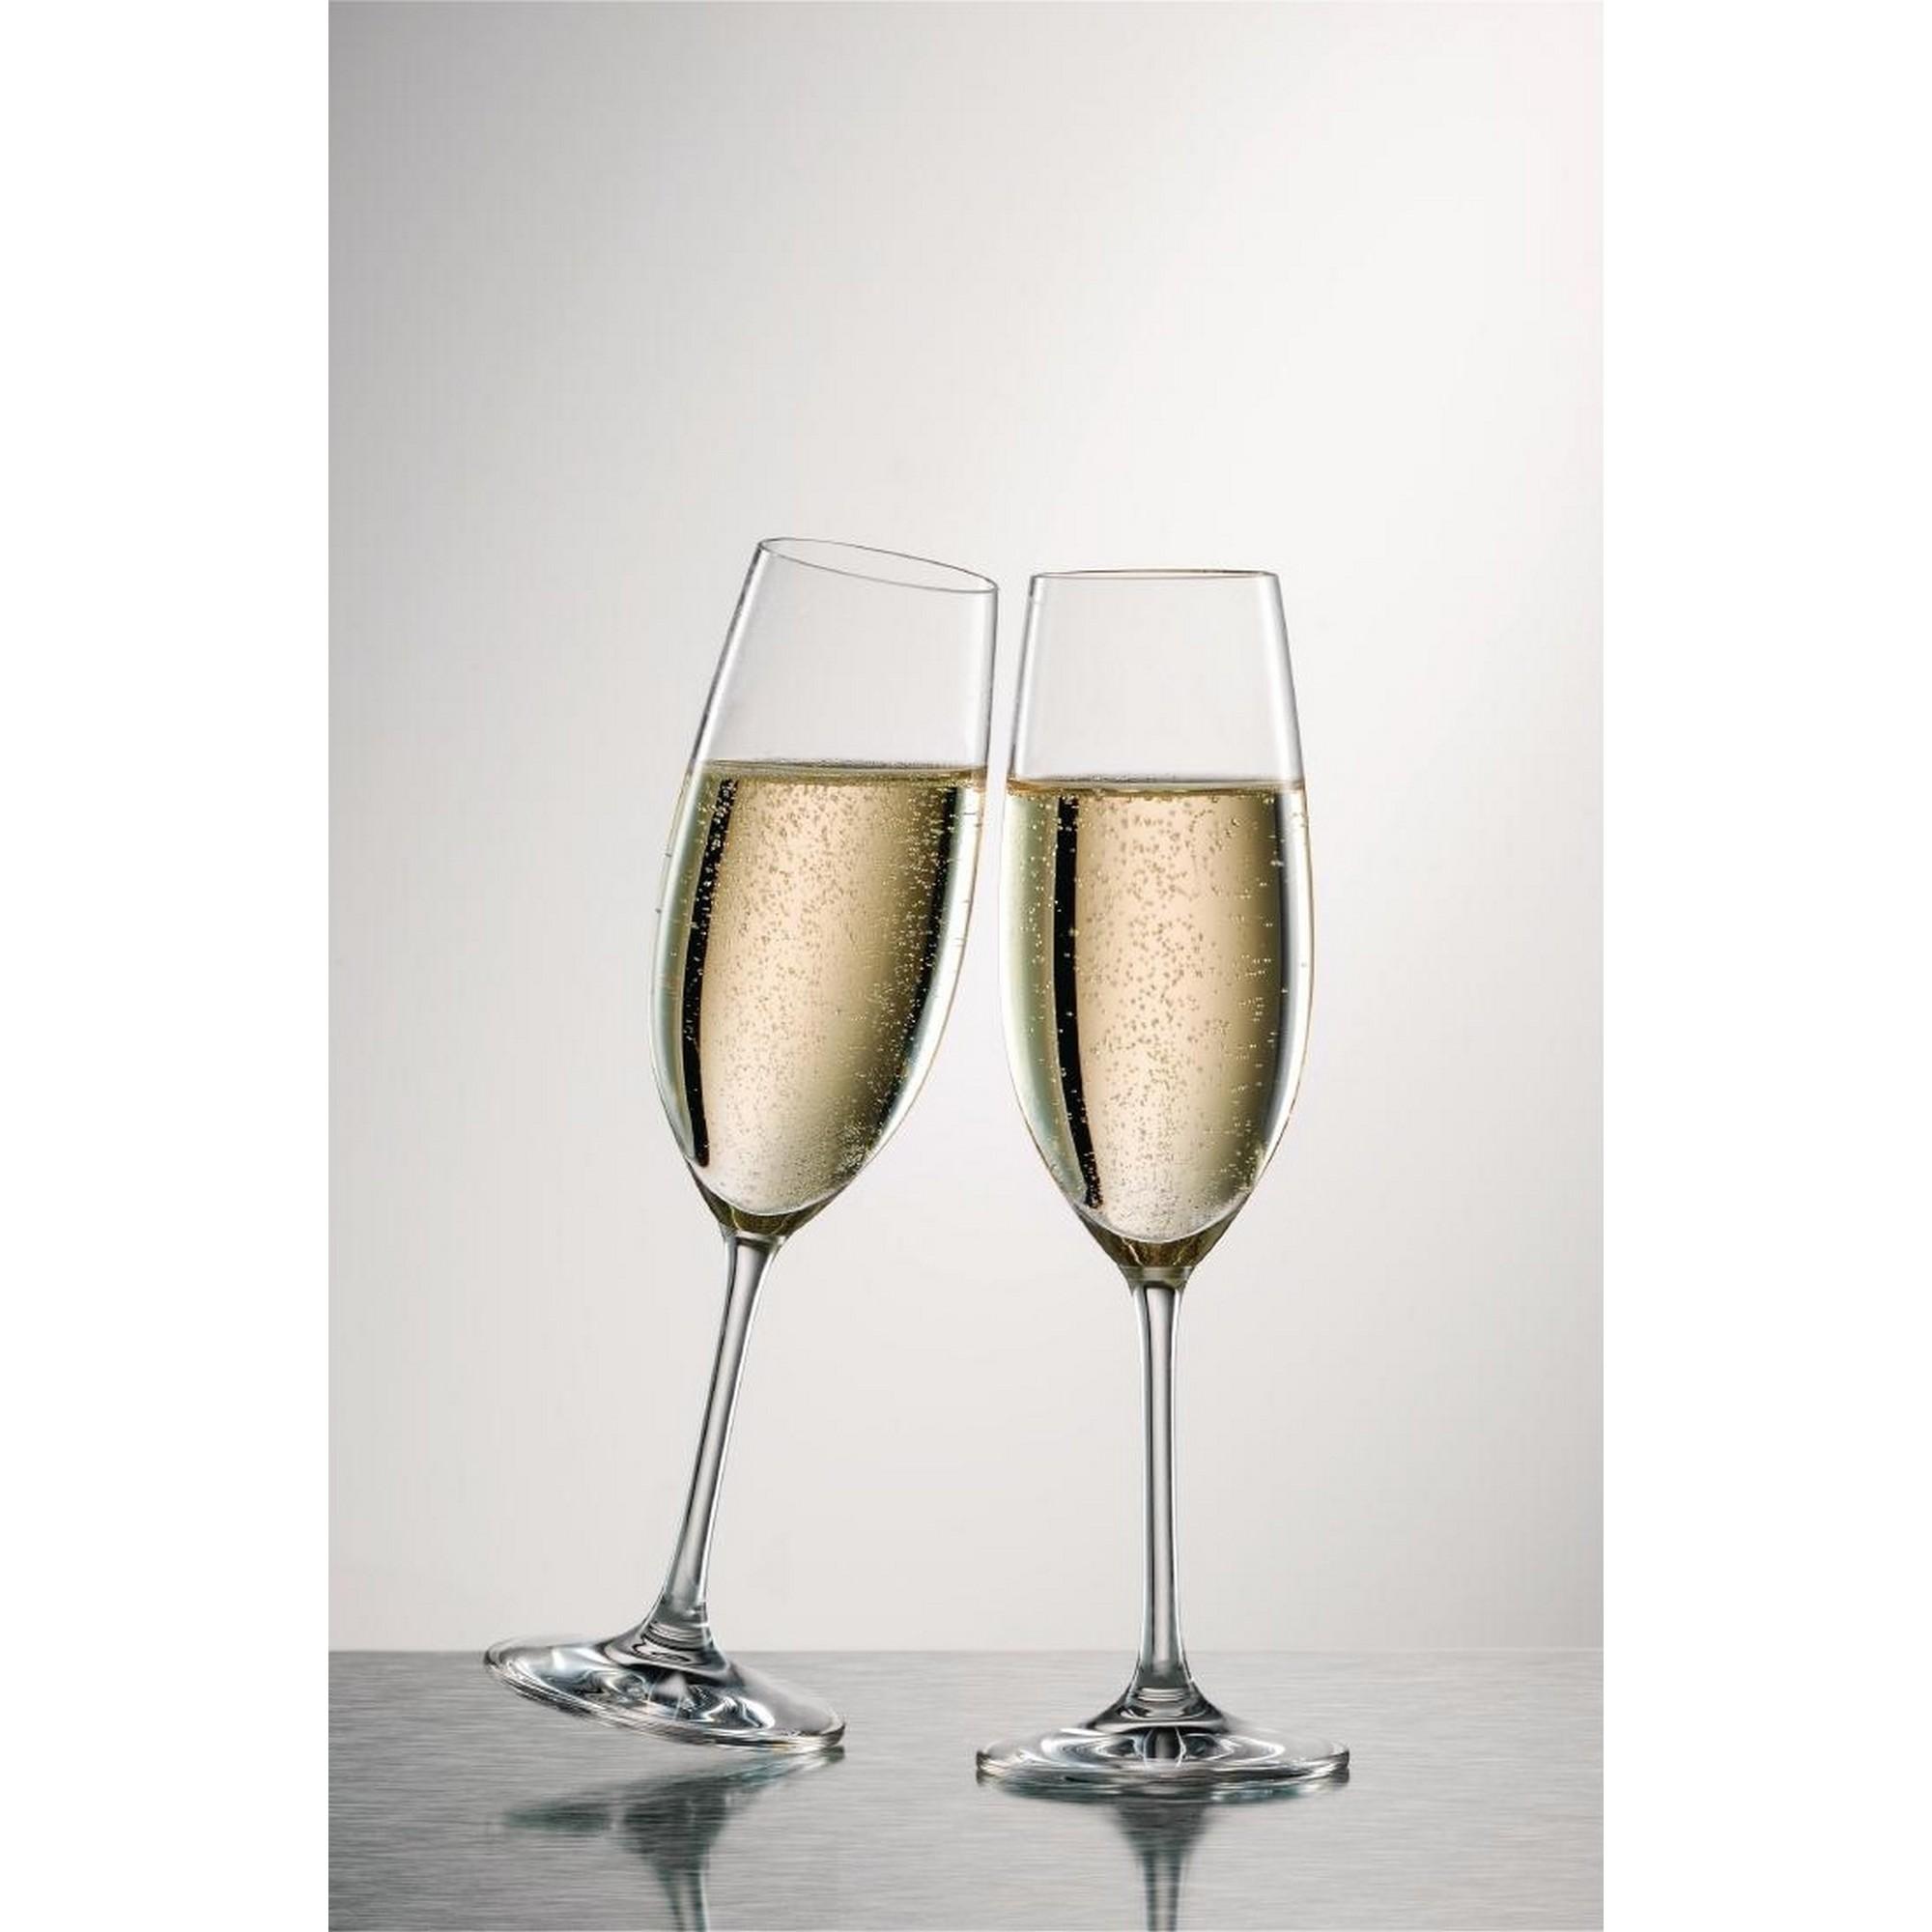 Kit de Taças Vinho Branco e Champagne Schott Zwiesel Ivento 12 Peças de Cristal